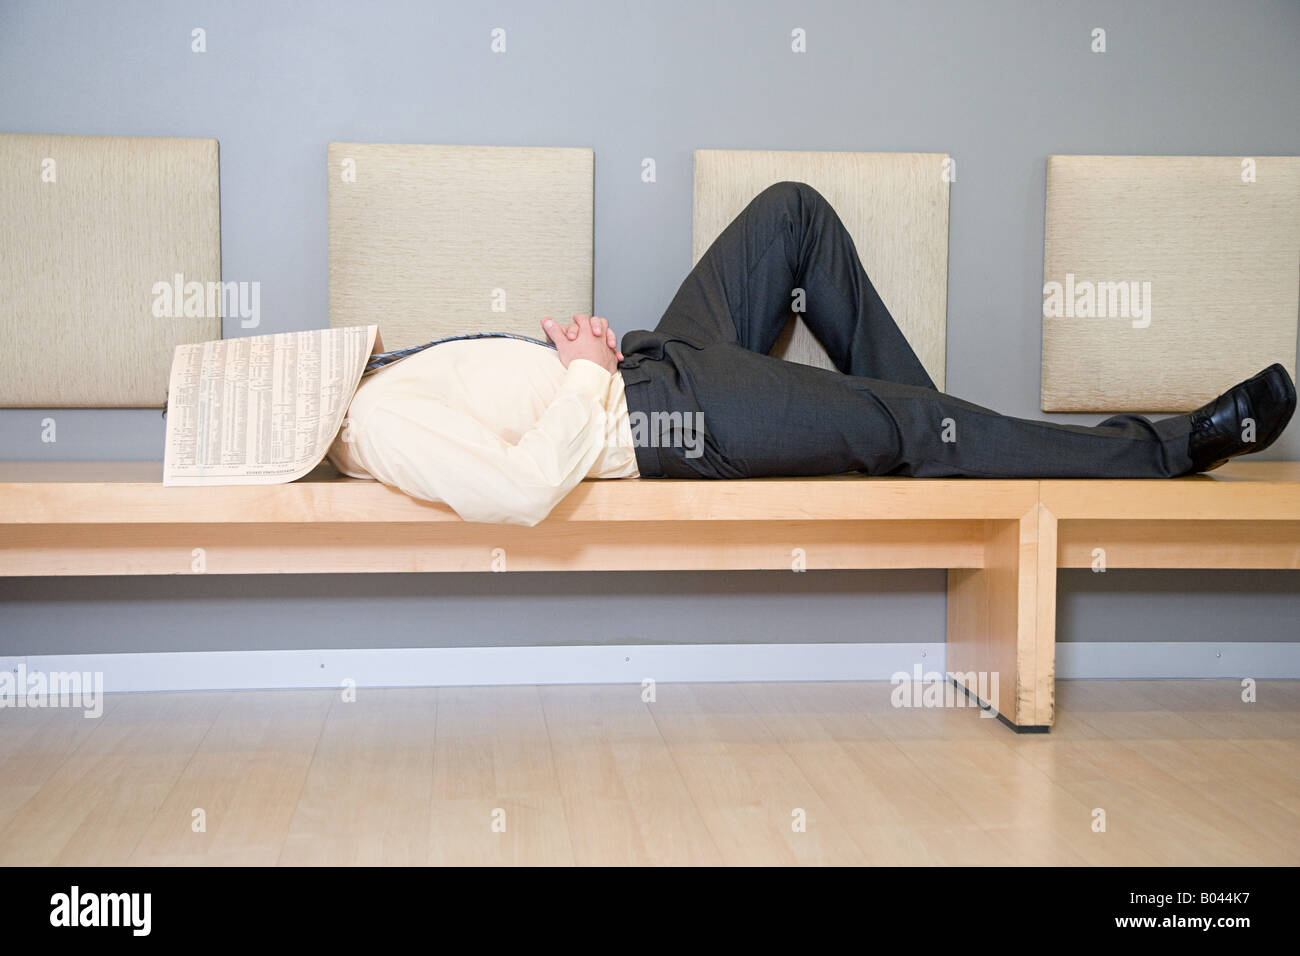 Man sleeping with newspaper over head - Stock Image